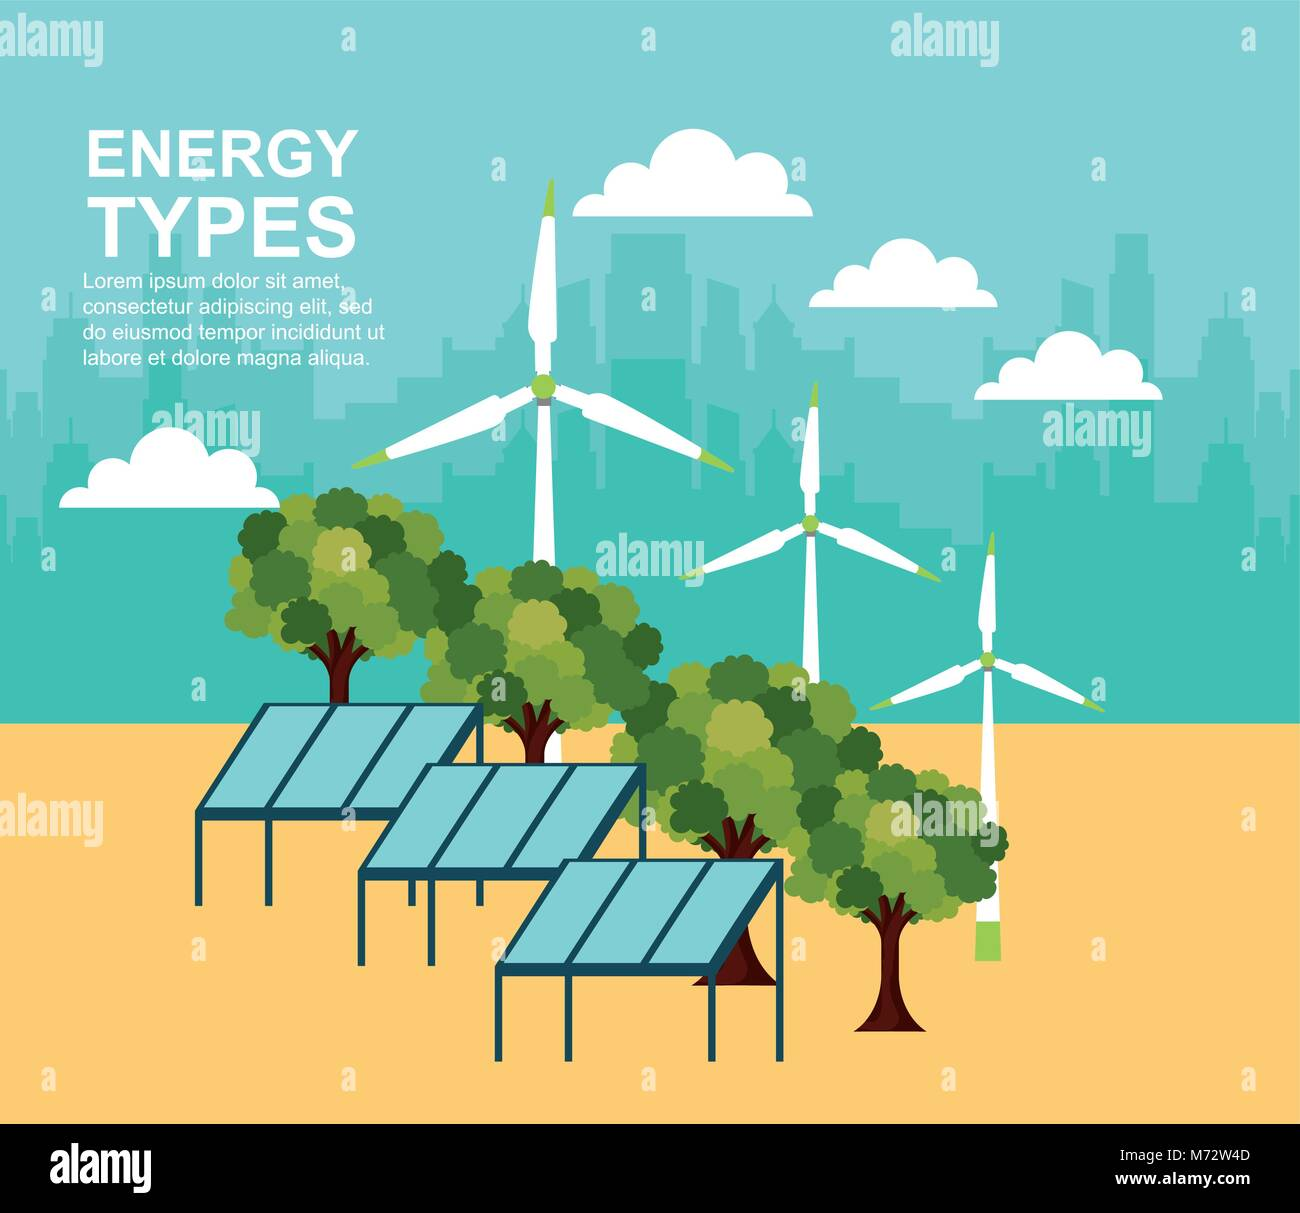 Forest Solar Wind Turbine Stock Photos & Forest Solar Wind Turbine